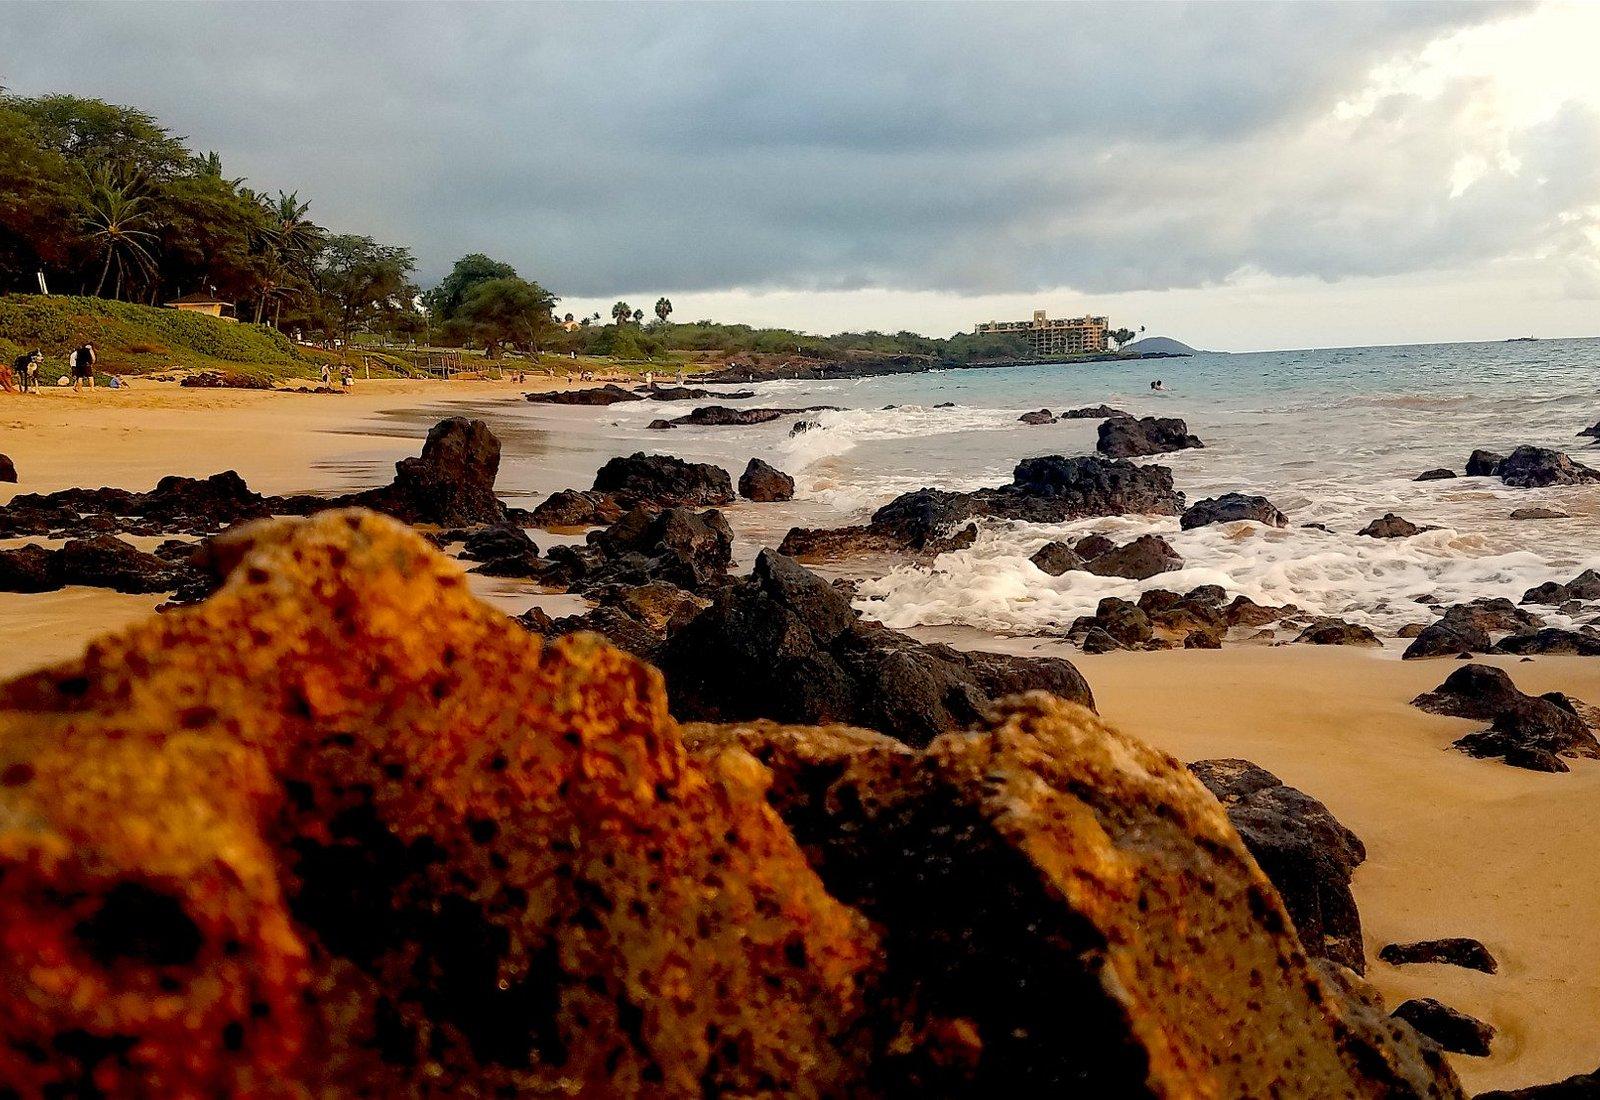 Kama'ole Beach ll in the evening.